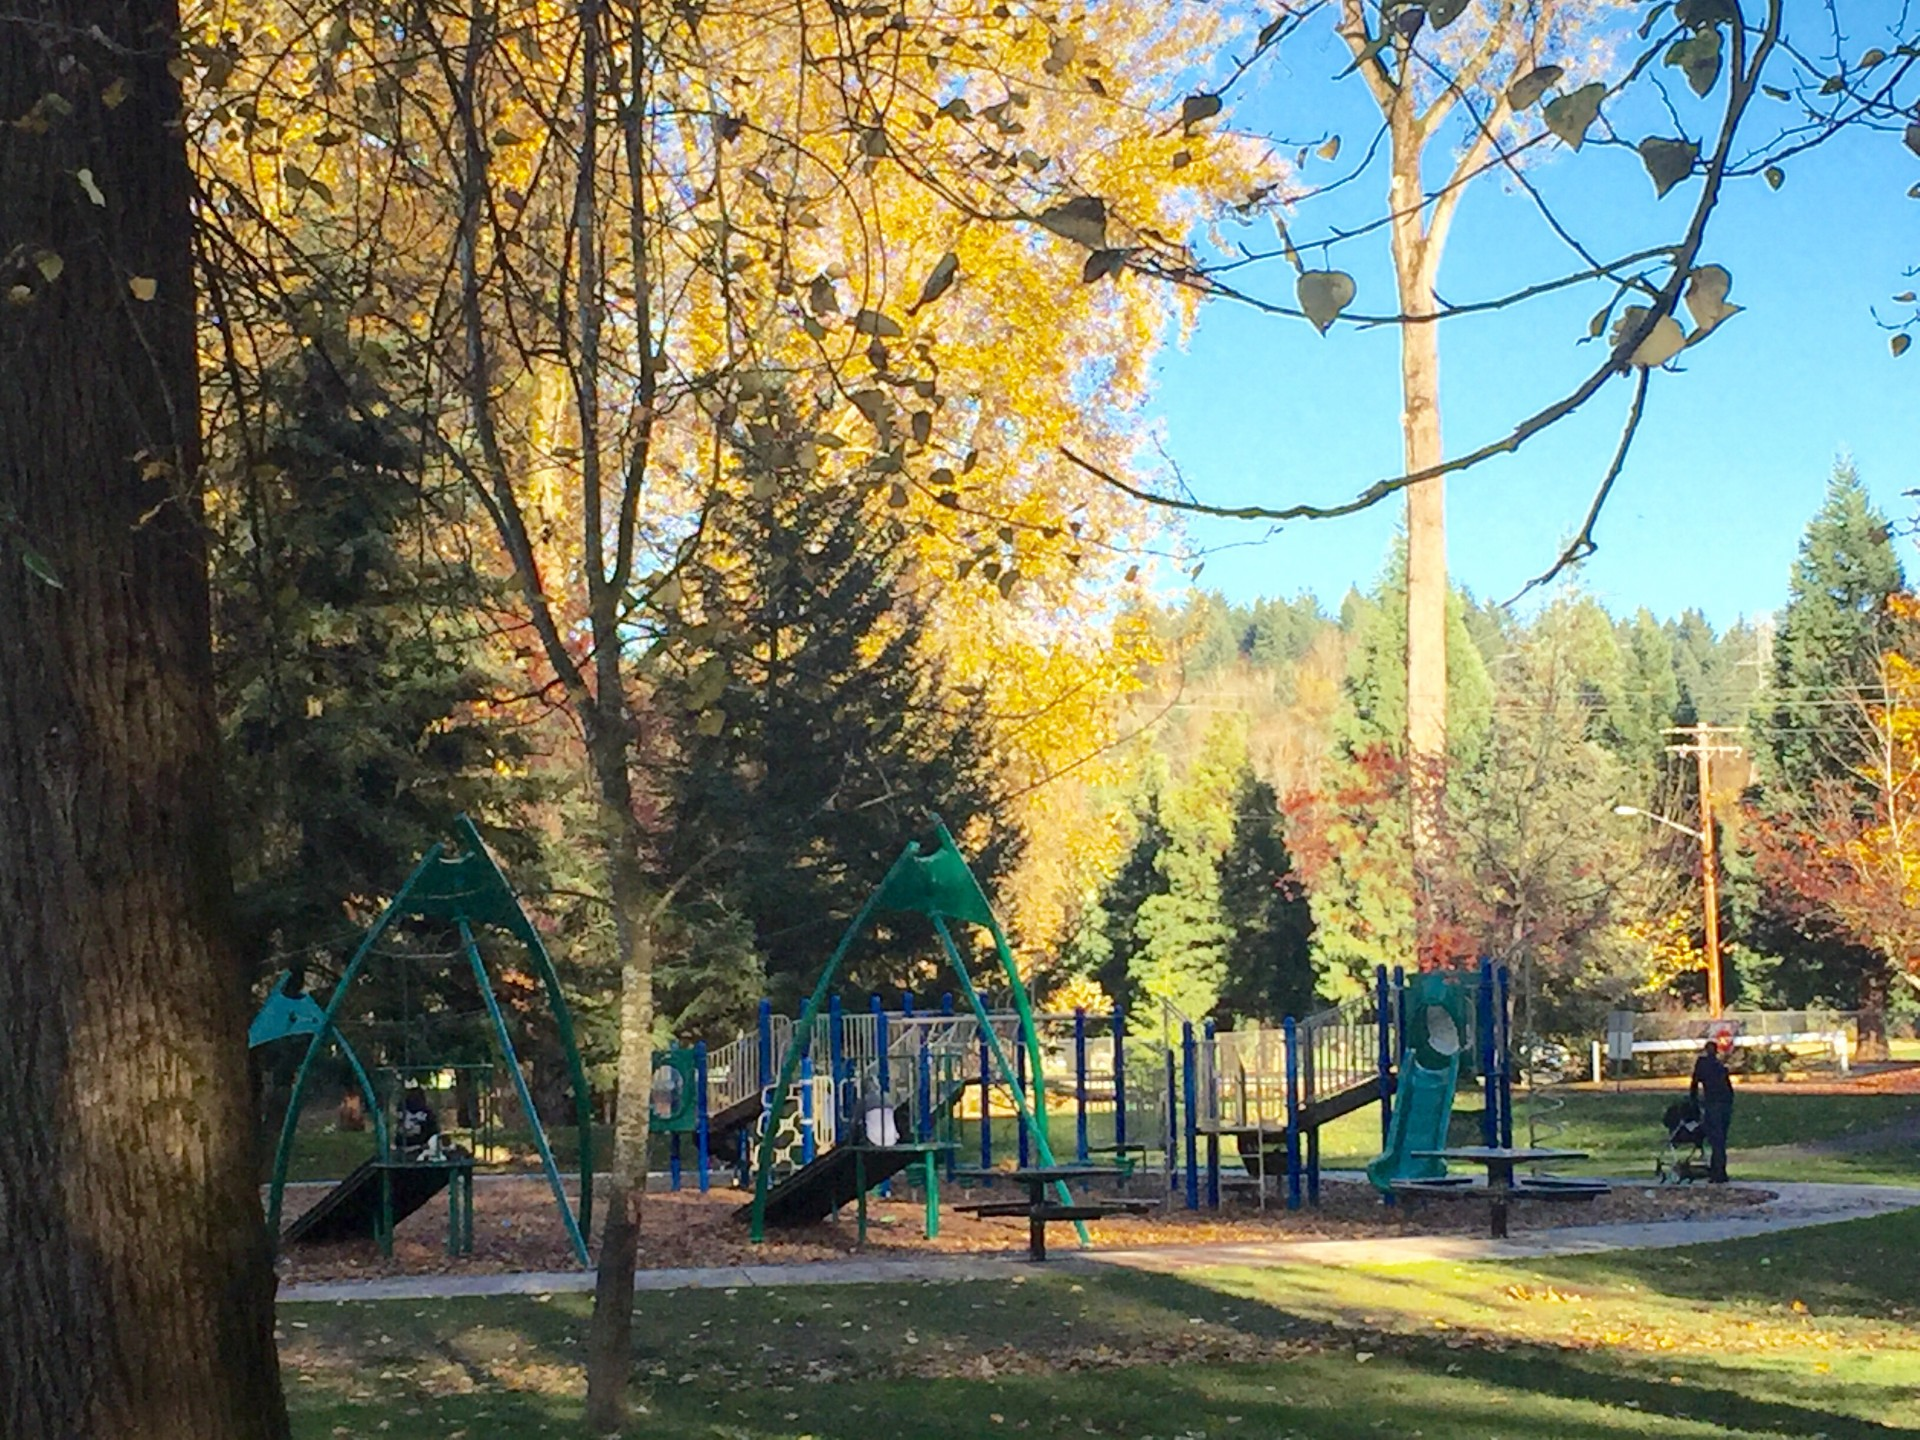 Isaac Evans Park